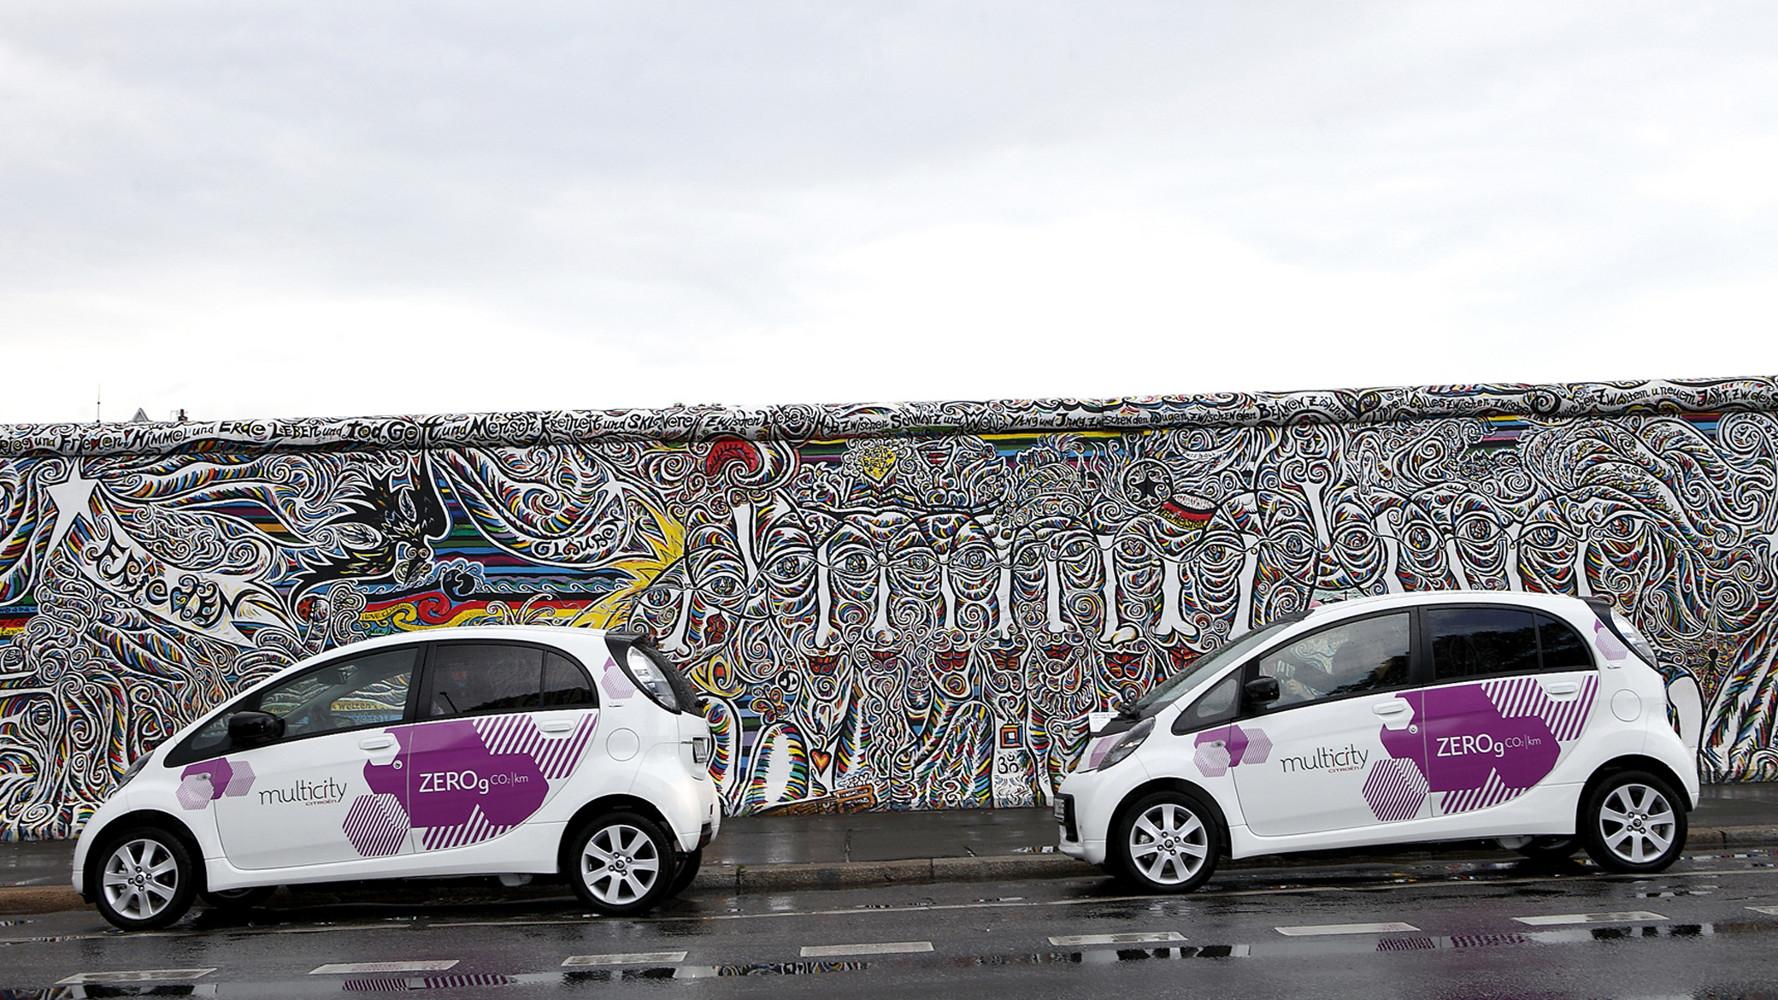 Citroën Multicity zieht positive Zwischenbilanz